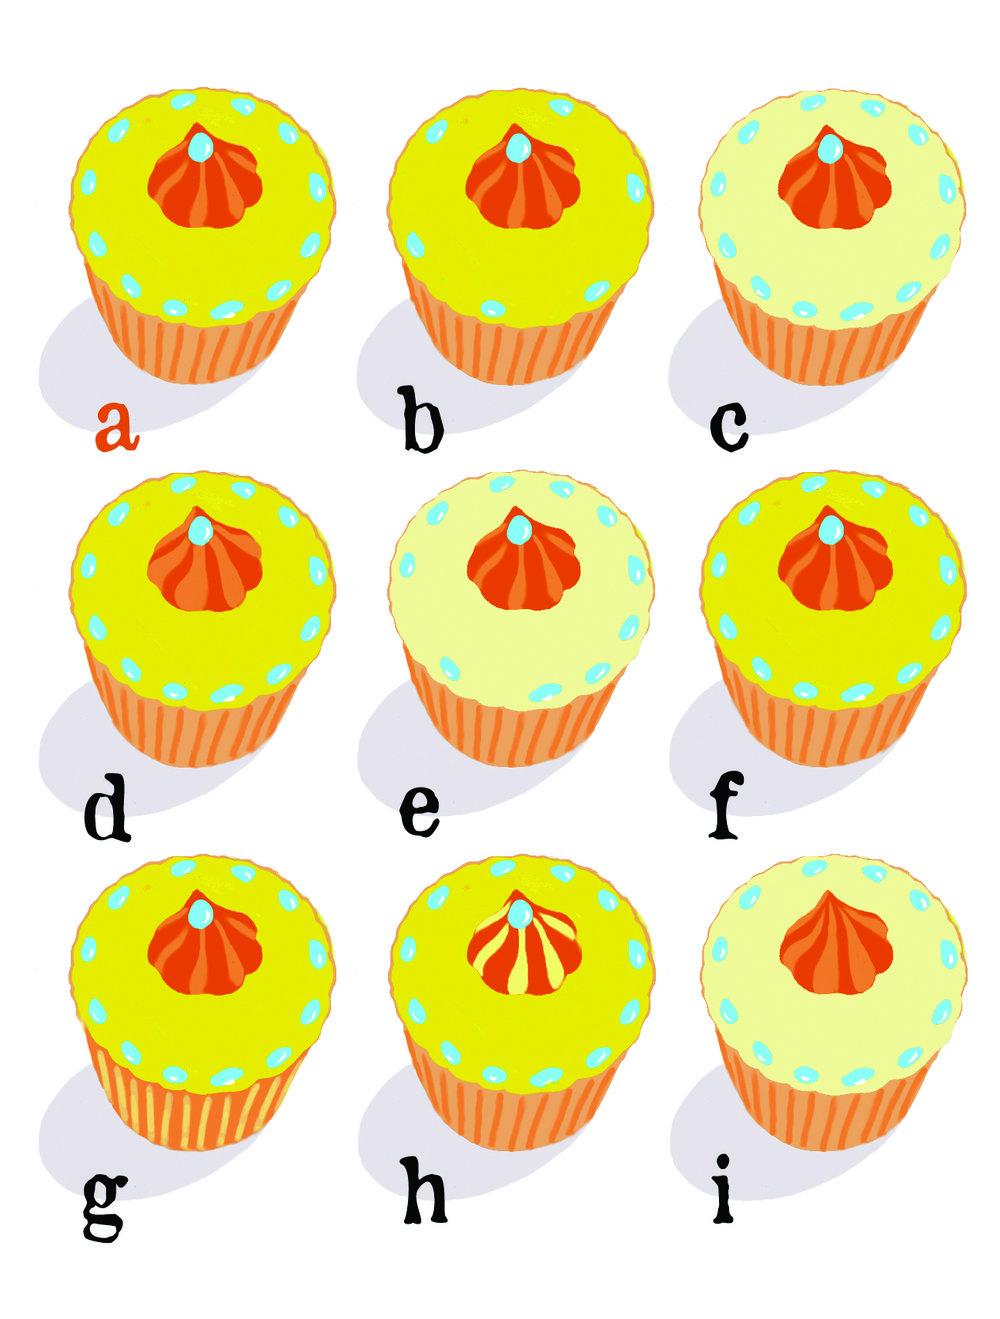 duos - cupcakes - A=F.jpg